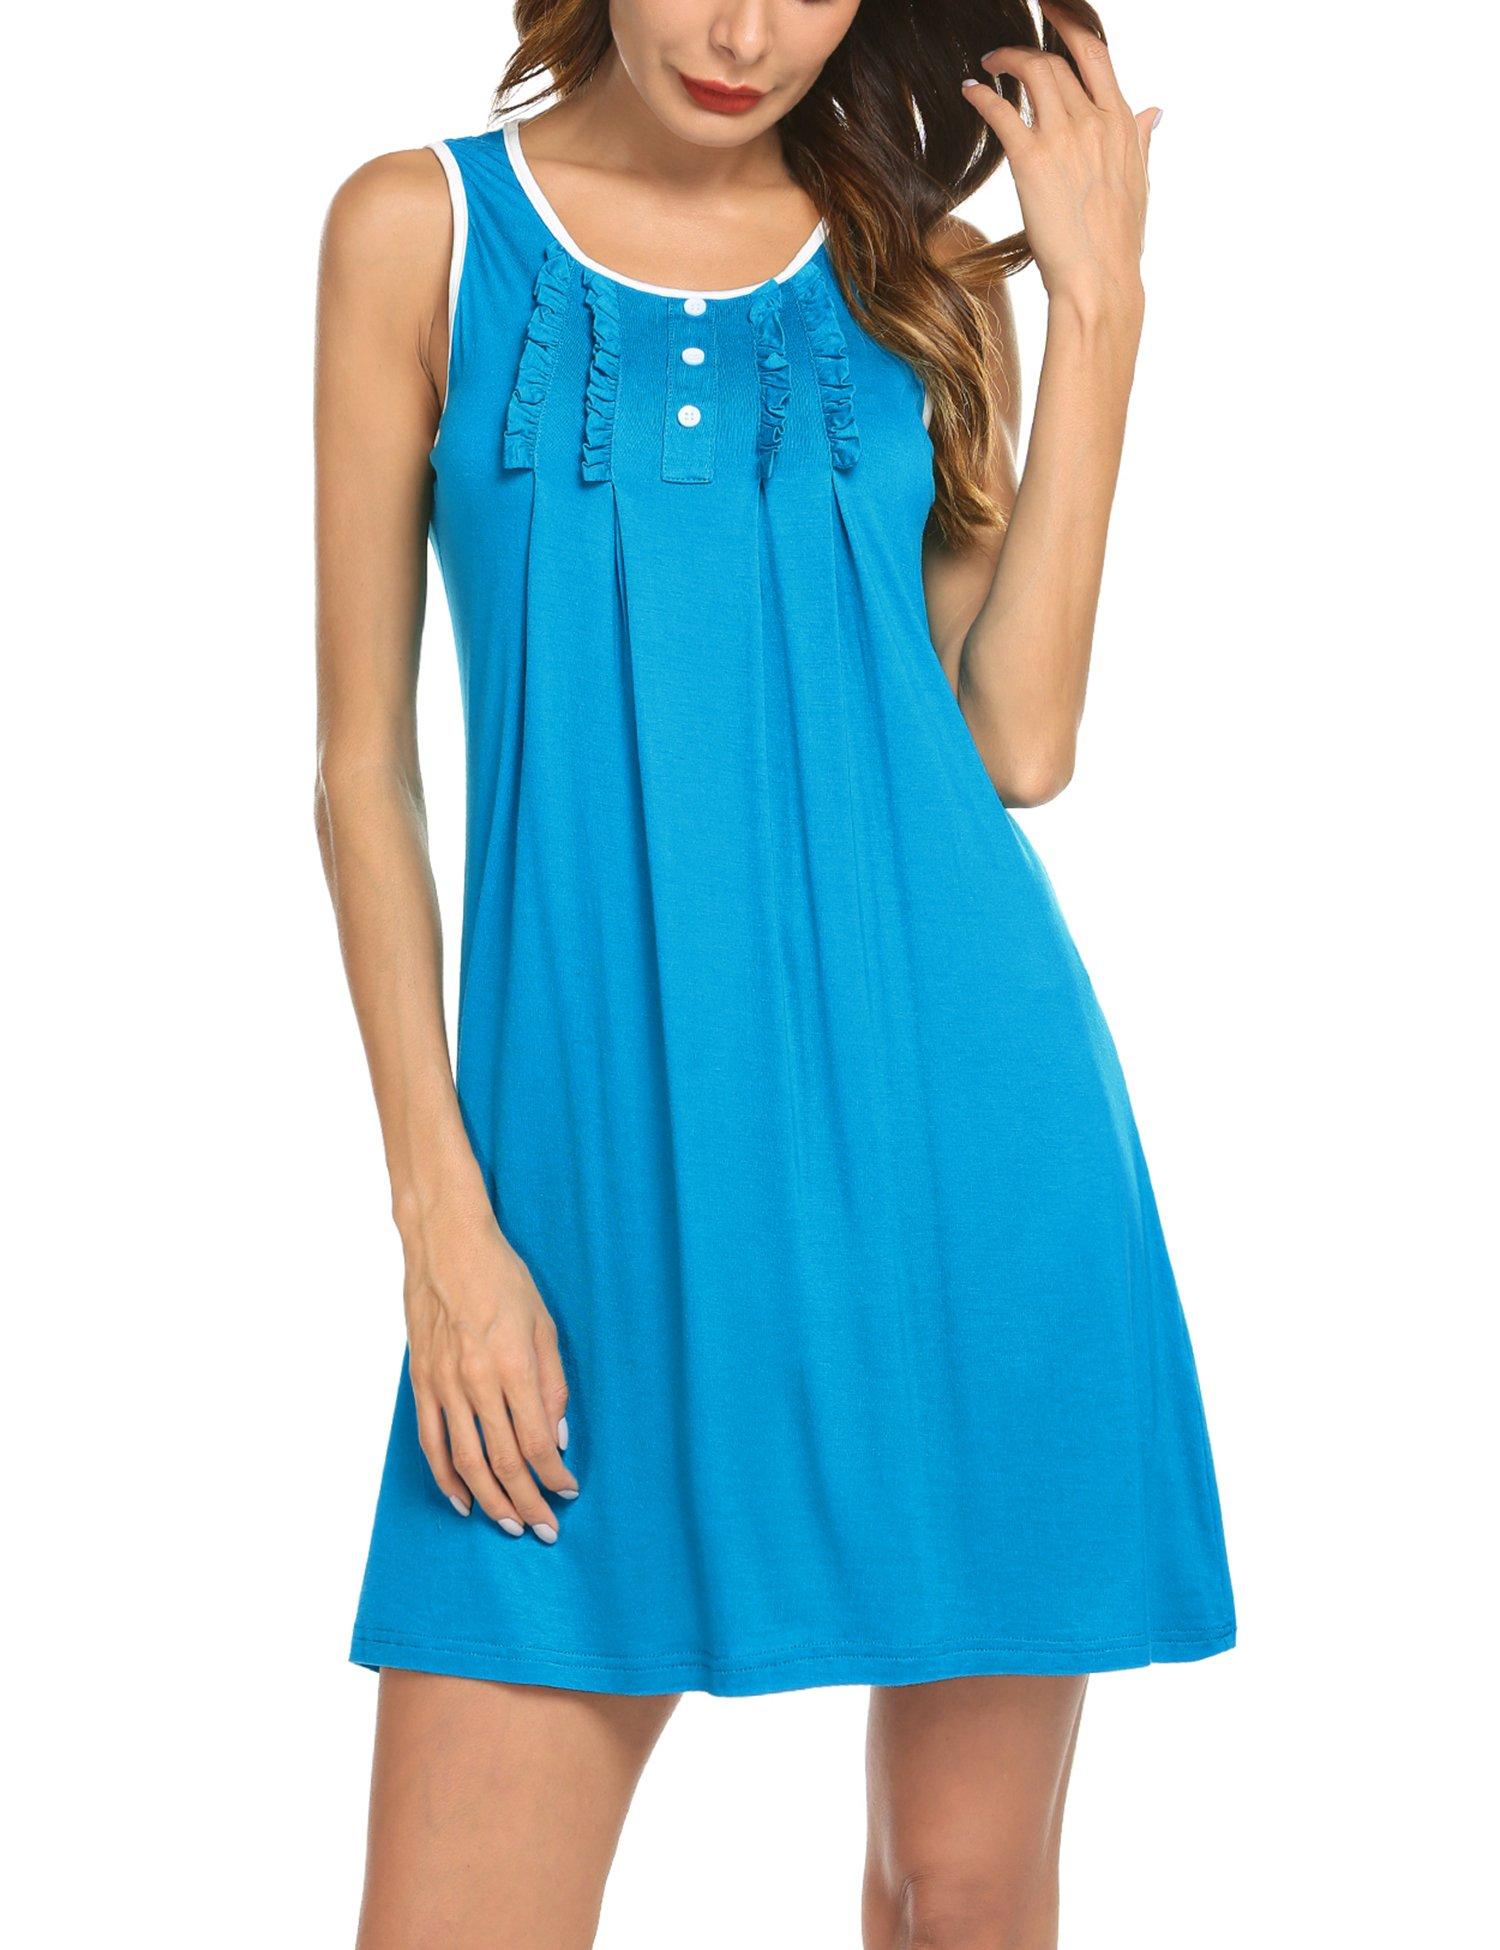 Hotouch Nightgowns for Women Short Sleeve Sleepwear Plus Size Nightshirt Blue XXL